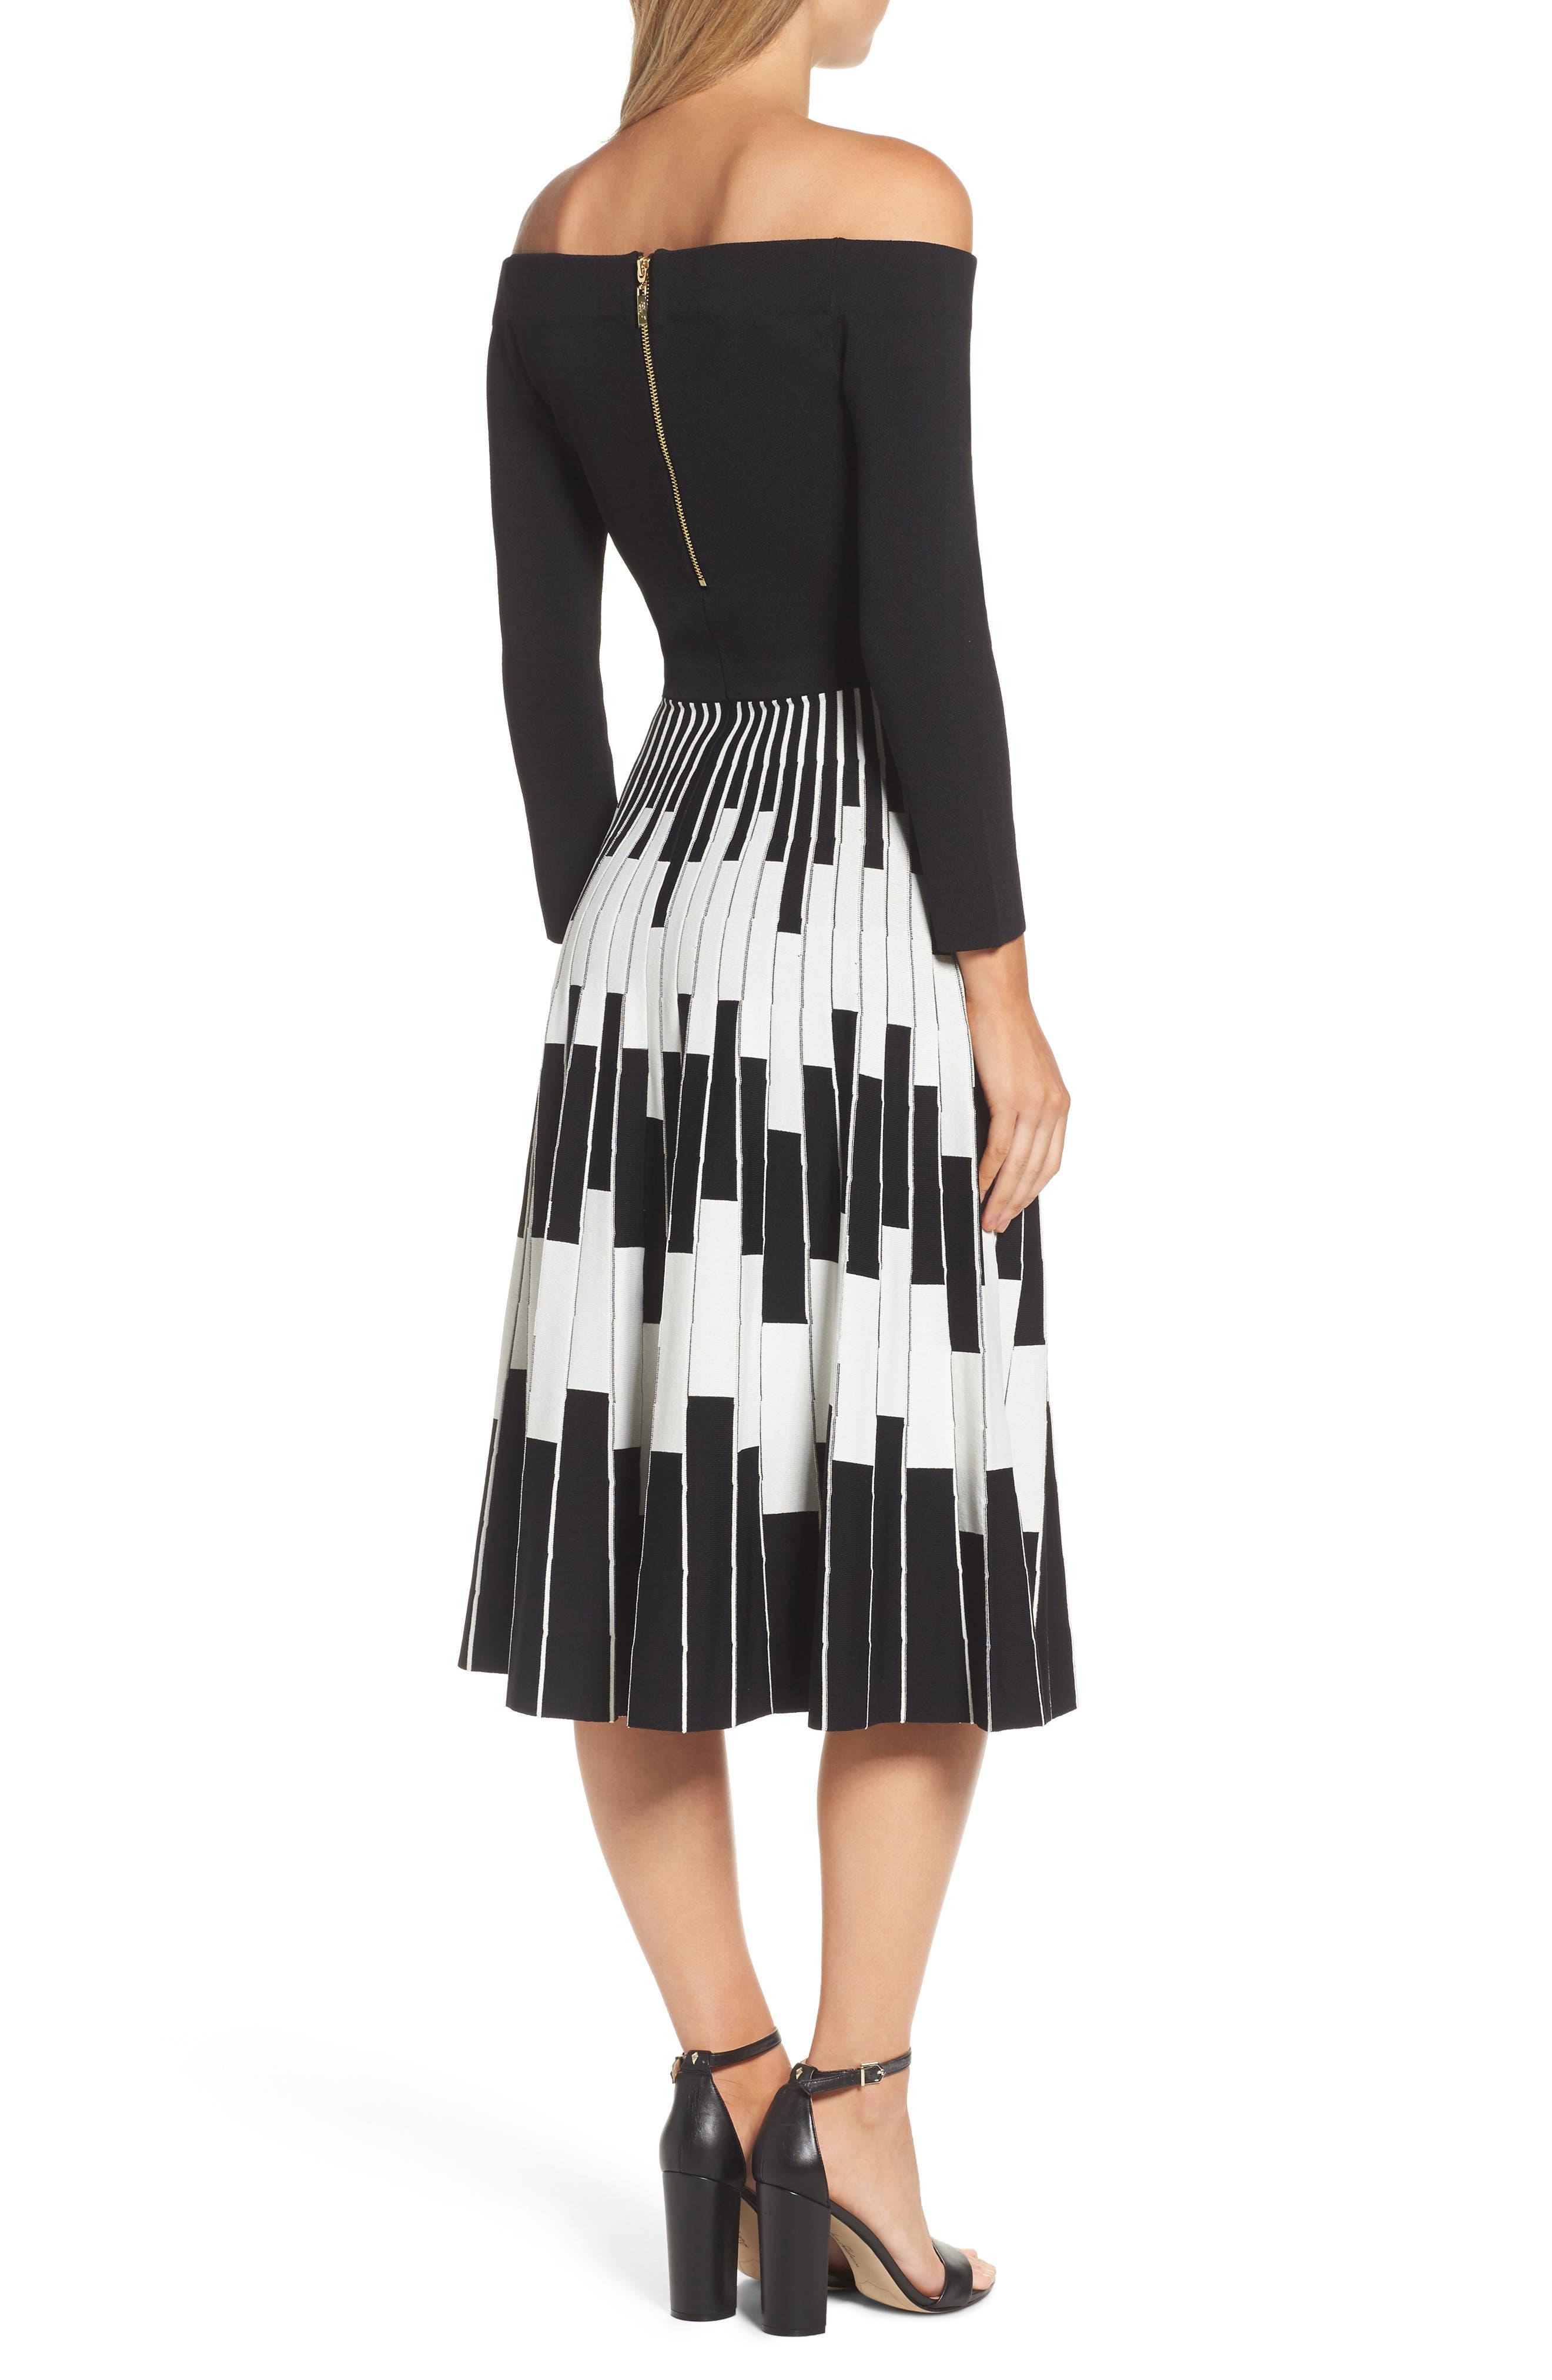 Off the Shoulder Midi Dress,                             Alternate thumbnail 2, color,                             BLACK/ IVORY